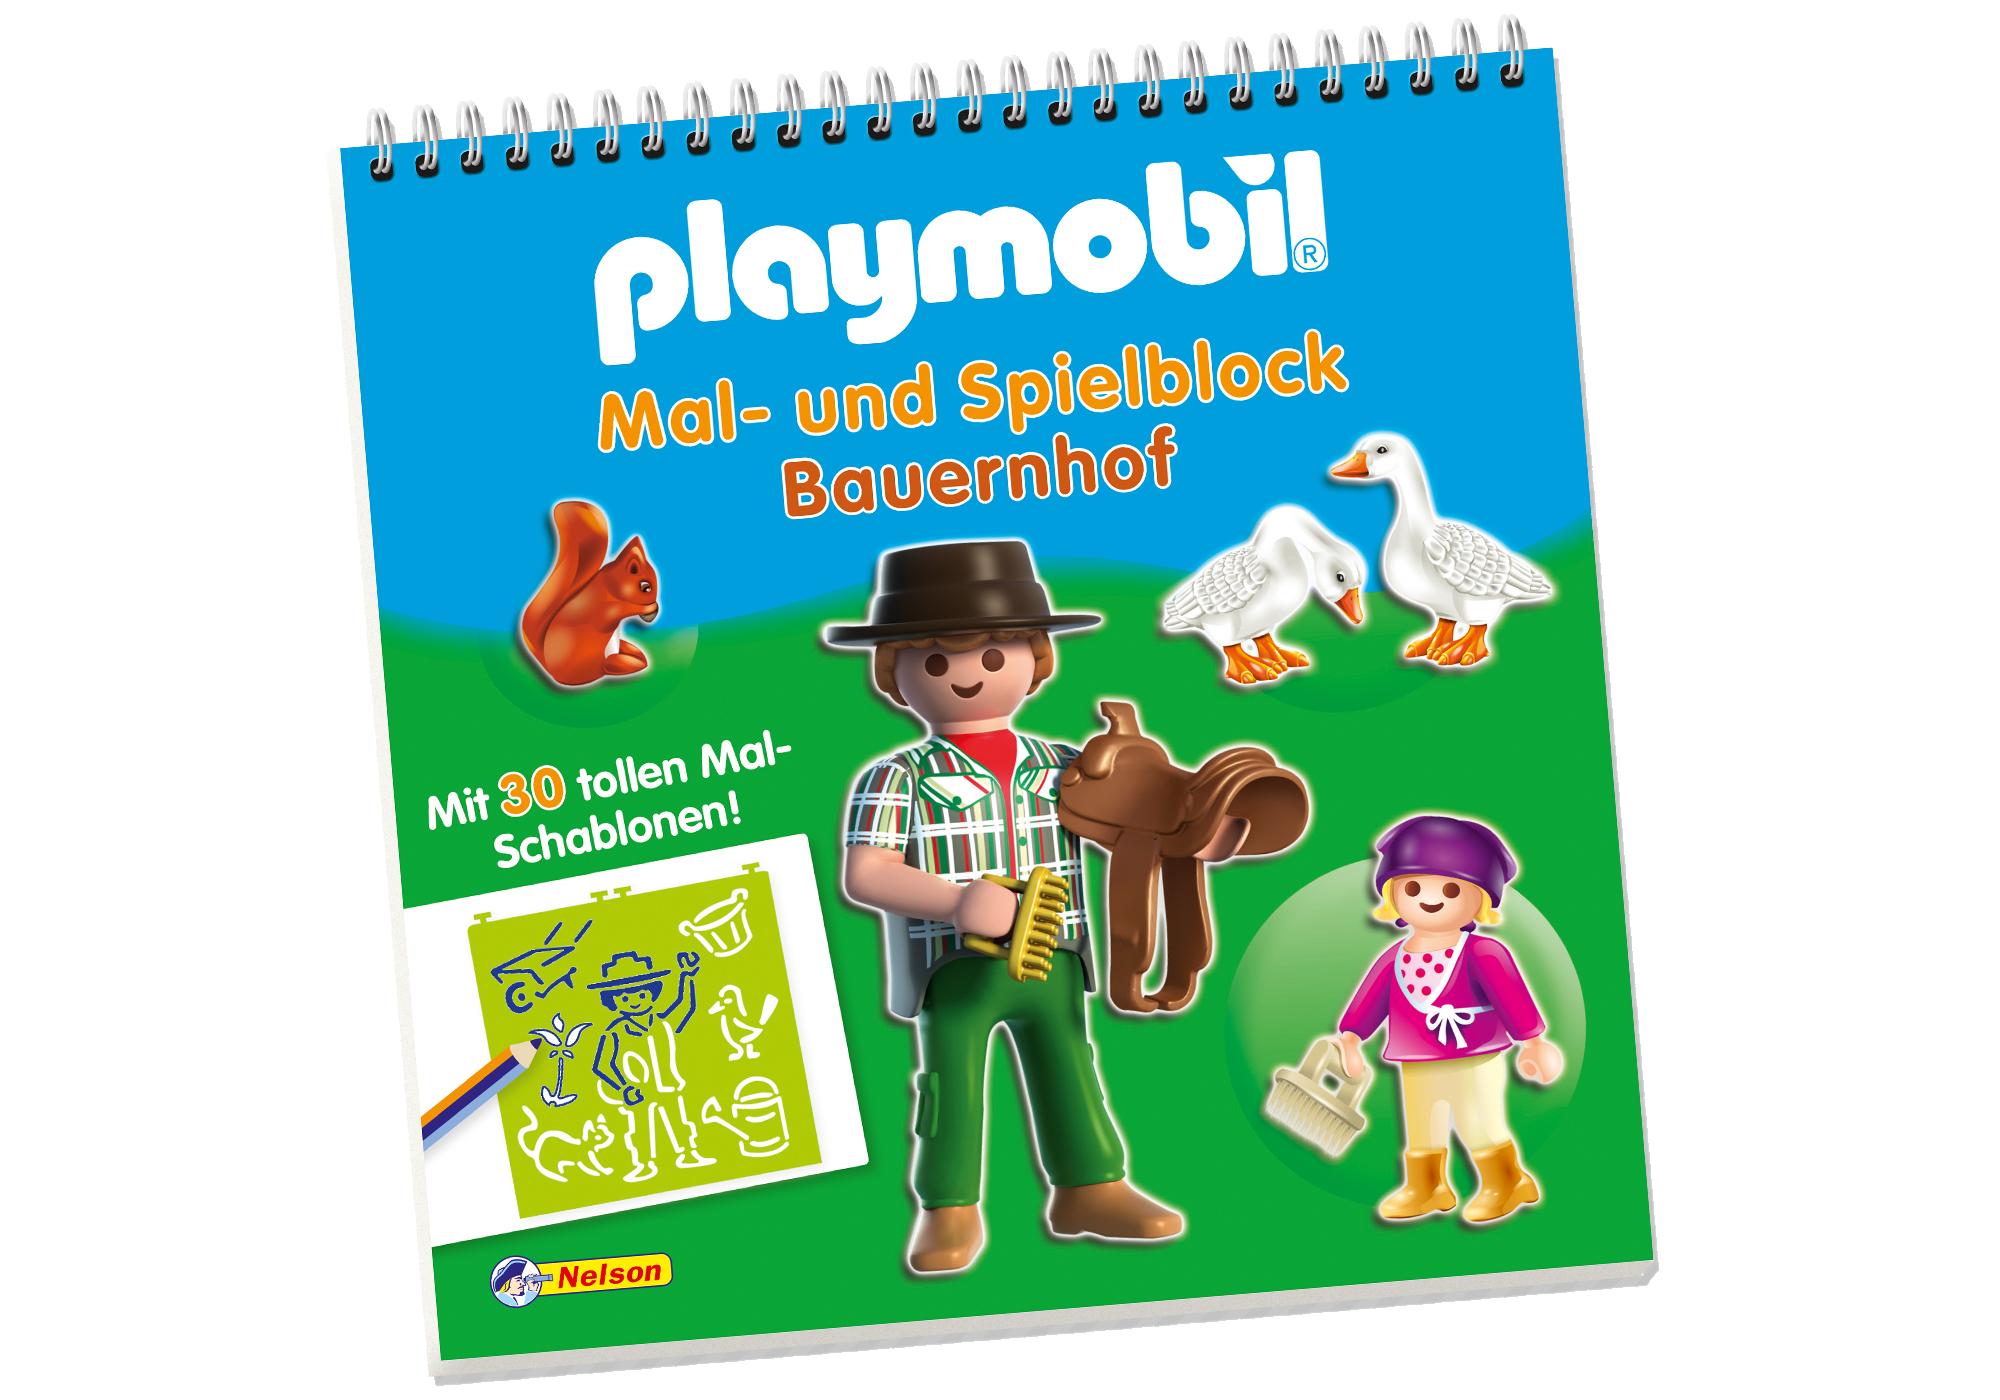 http://media.playmobil.com/i/playmobil/80236_product_detail